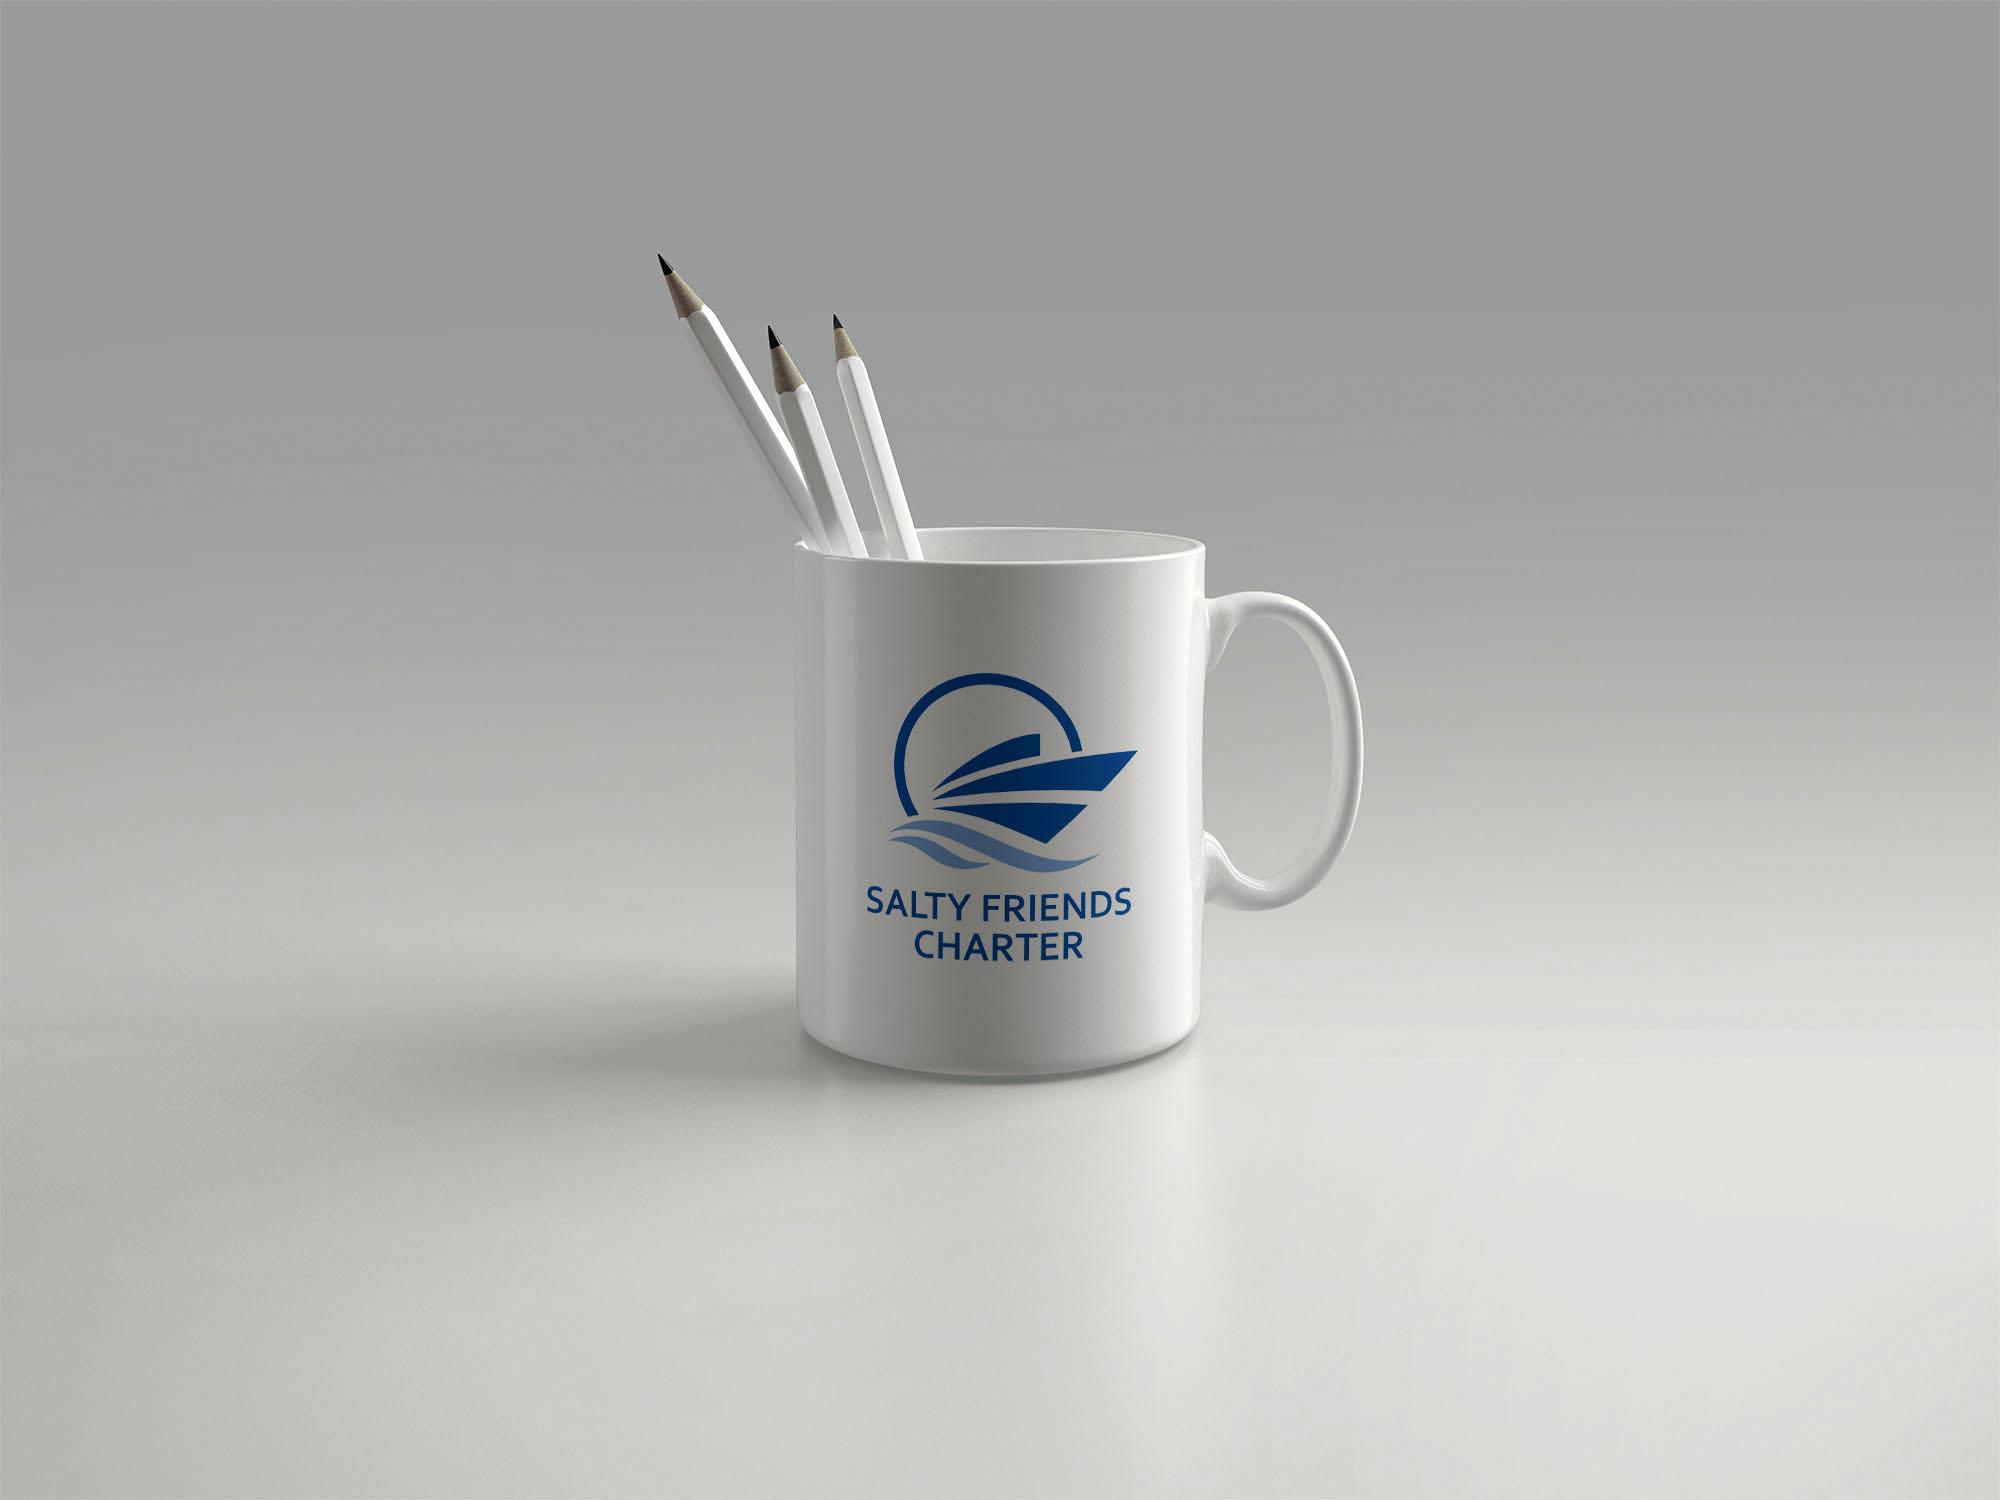 Разработка логотипа и наименования для чартерной компании  фото f_4375a96ca756fee8.jpg